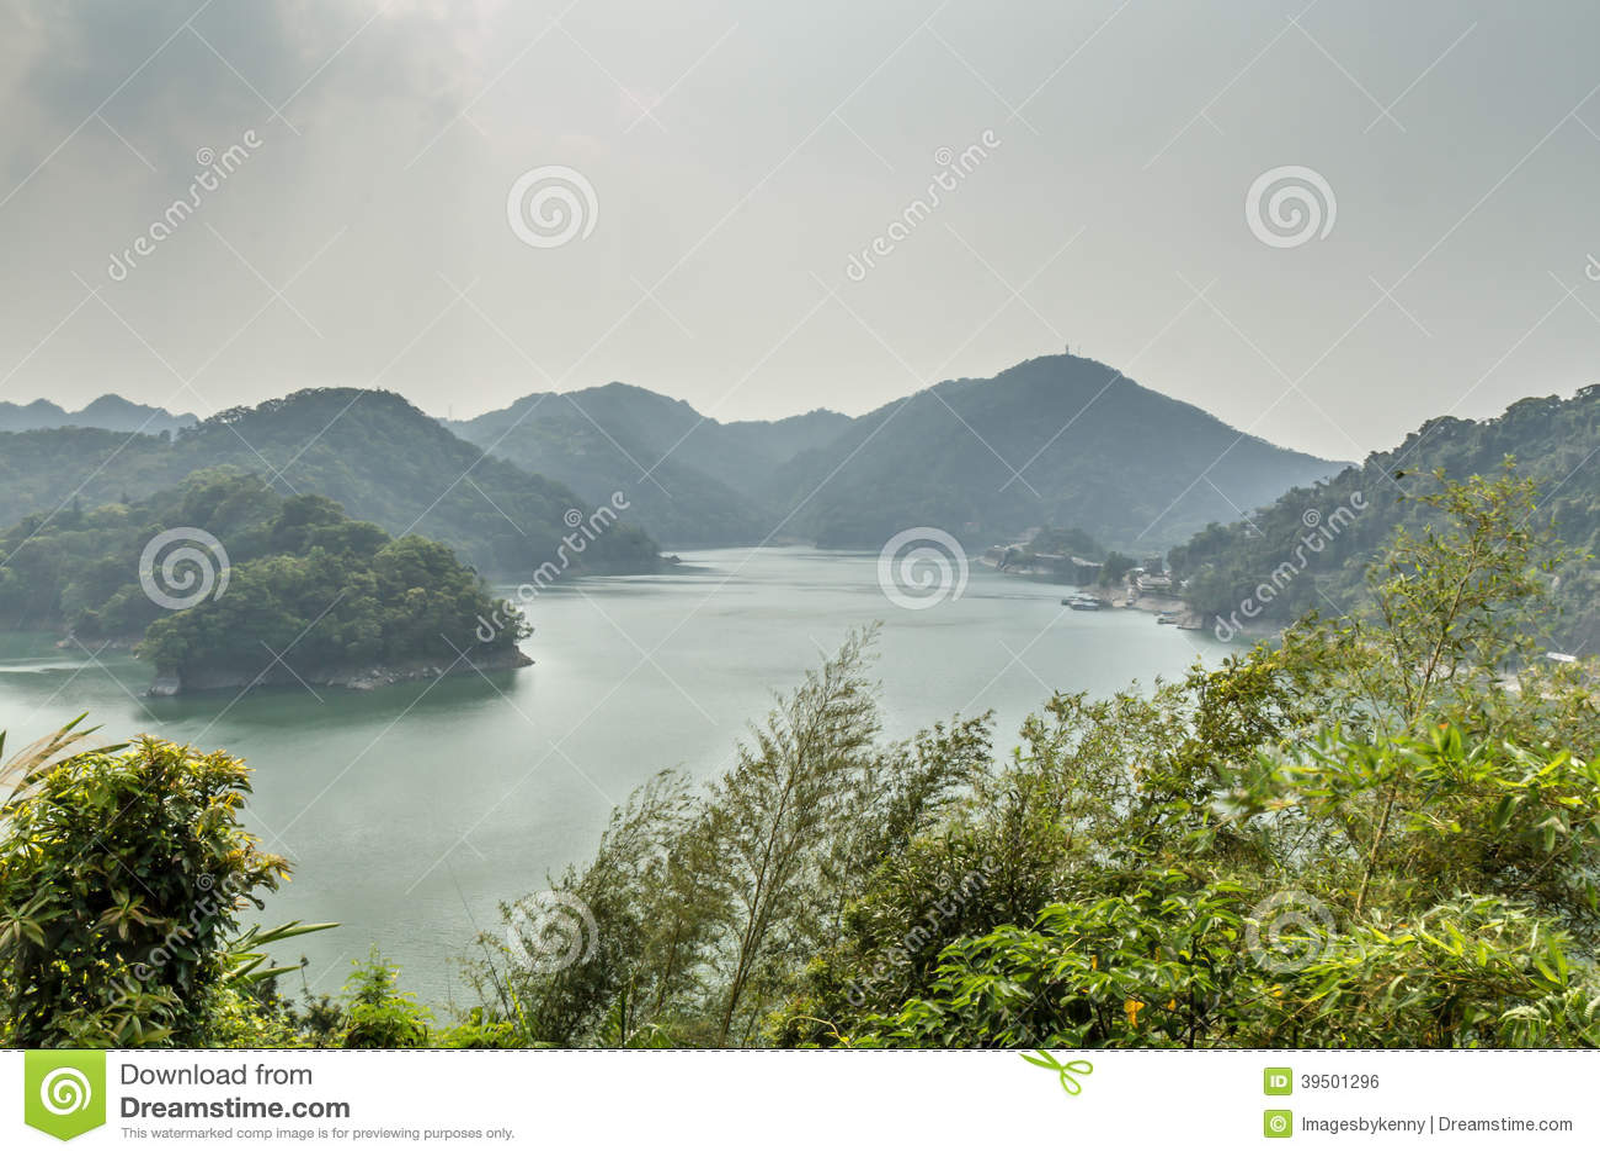 Beautiful jade green lake lake surrounded by mountains